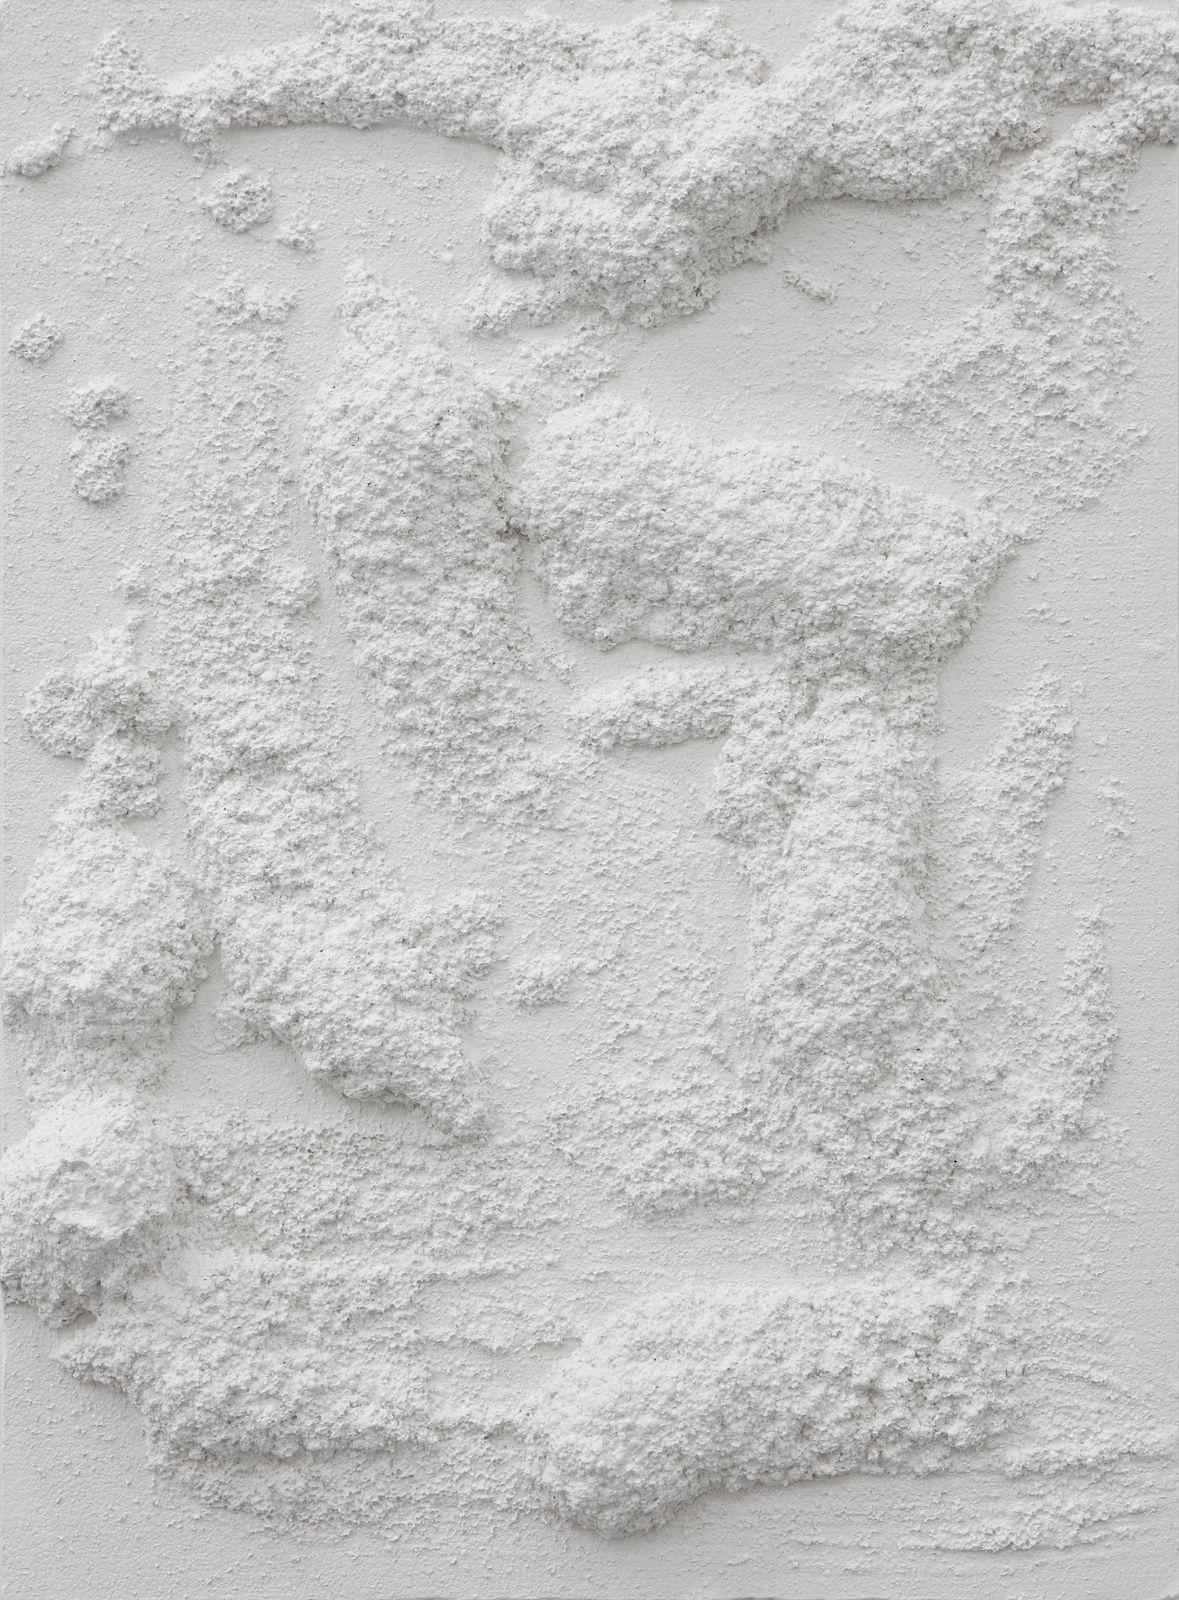 Untitled, 2012, plaster, 60 x 45 x 7,7 cm